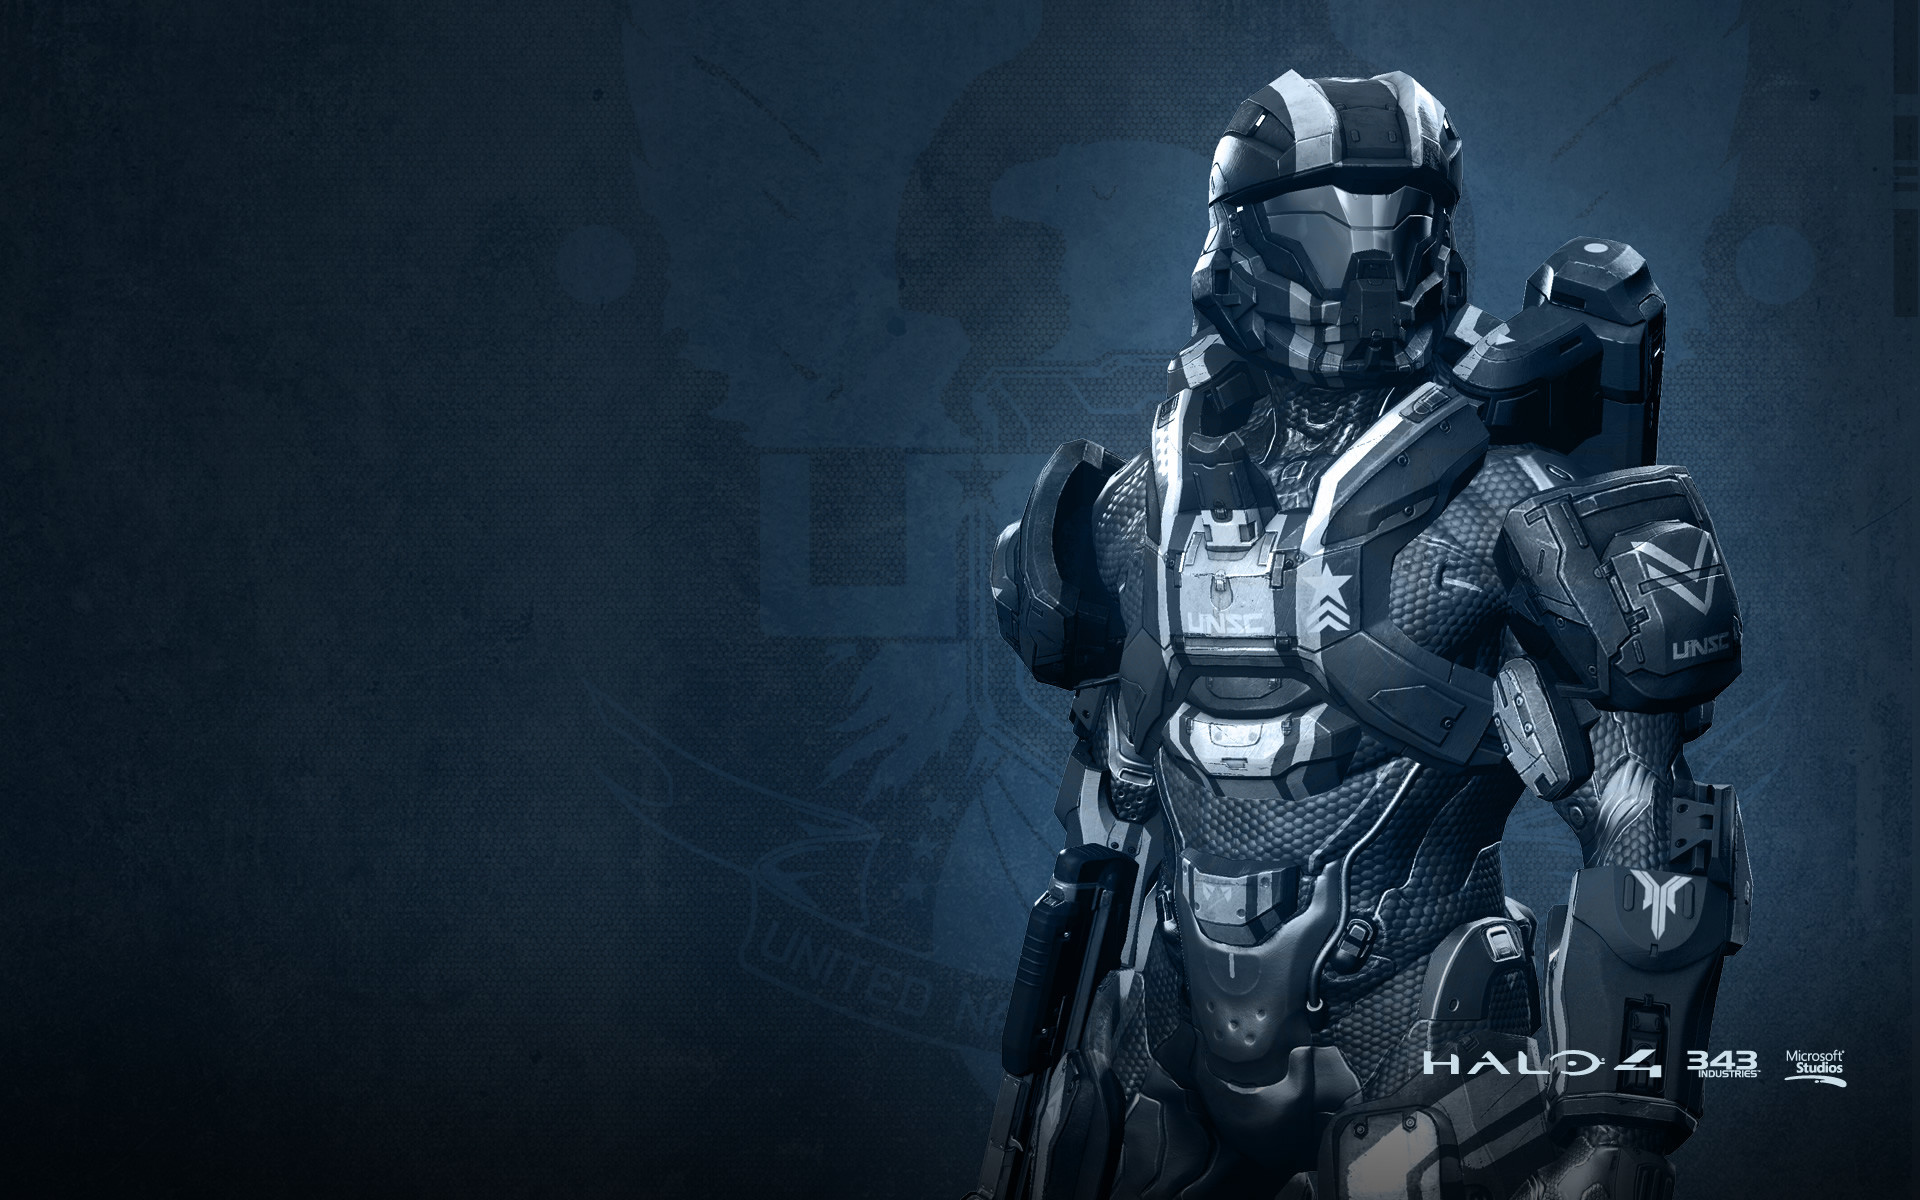 Res: 1920x1200, Halo 4 HD Wallpaper | Hintergrund |  | ID:354232 - Wallpaper Abyss